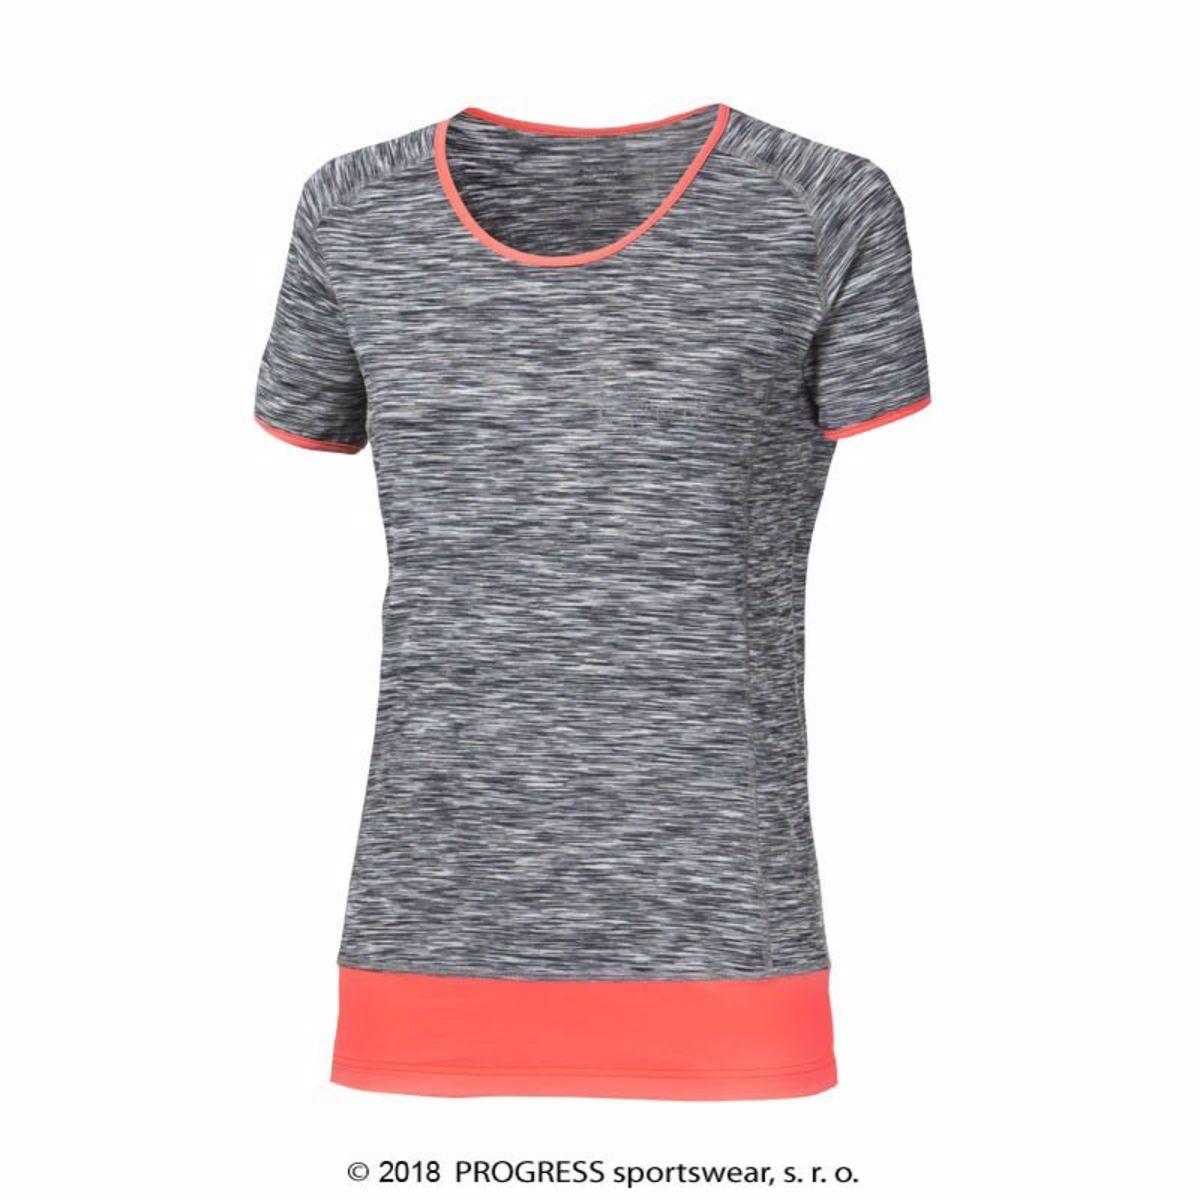 50a3f3faffa Progress MG LAKOTA dámske tričko s krátkym rukávom